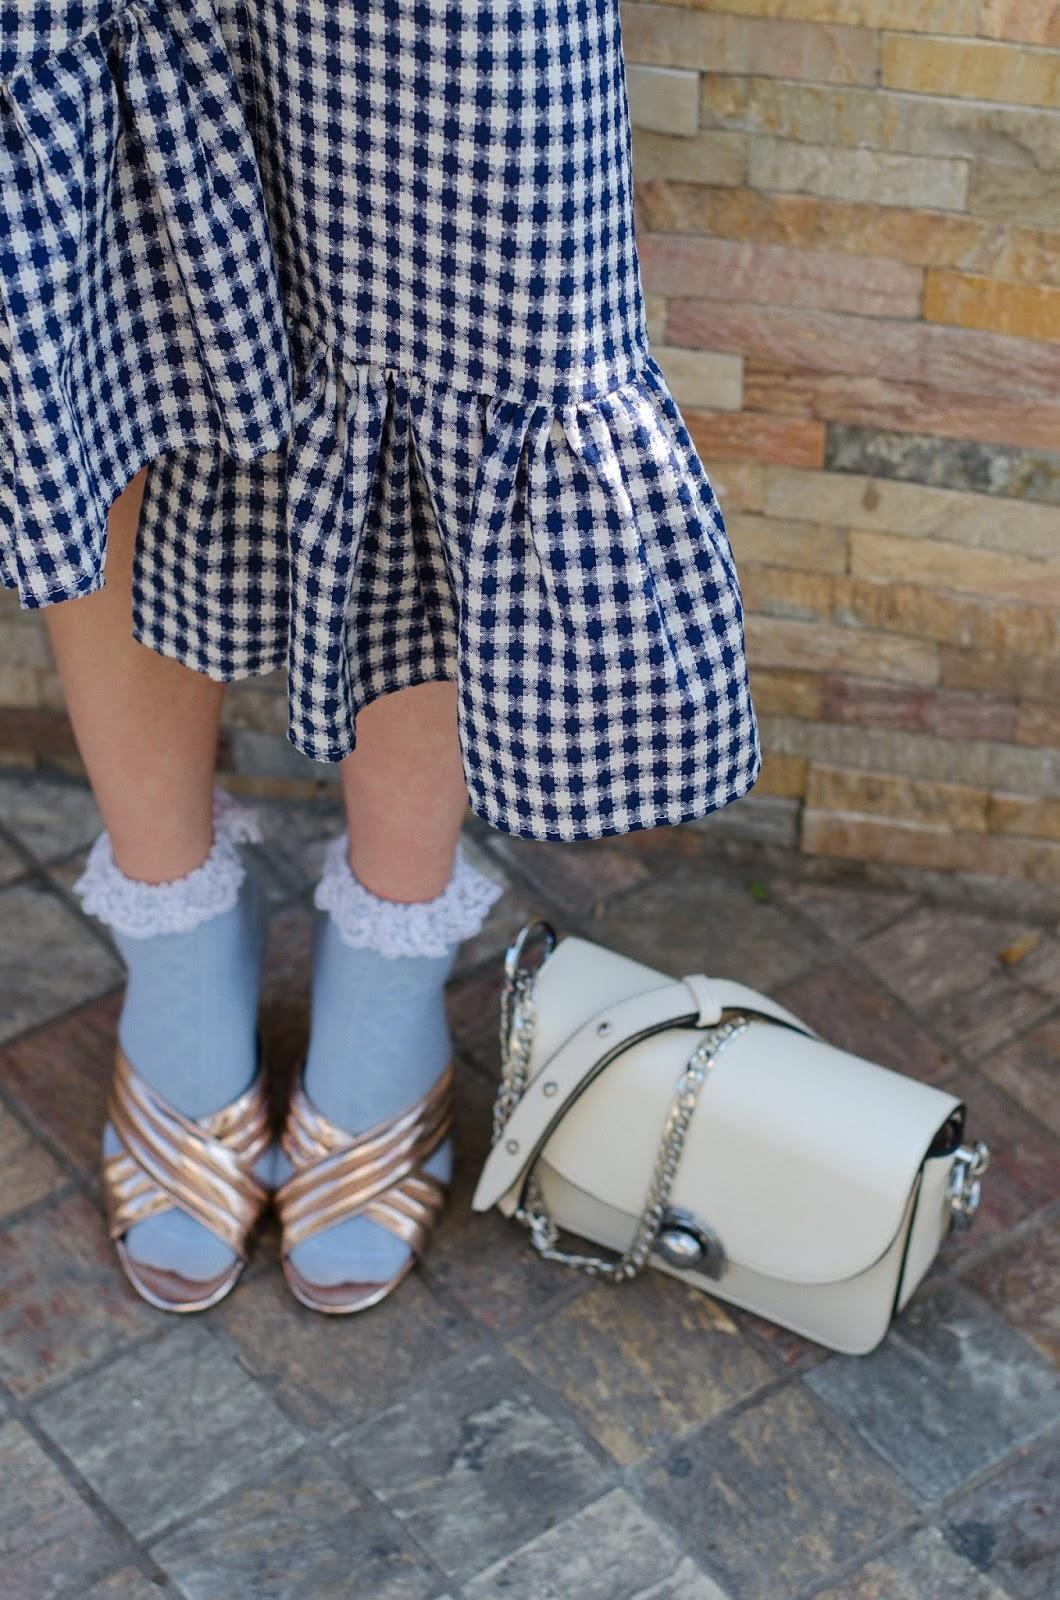 fashion blogger diyorasnotes diyora beta mix prints ruffles checked skirt mules asos socks and heels